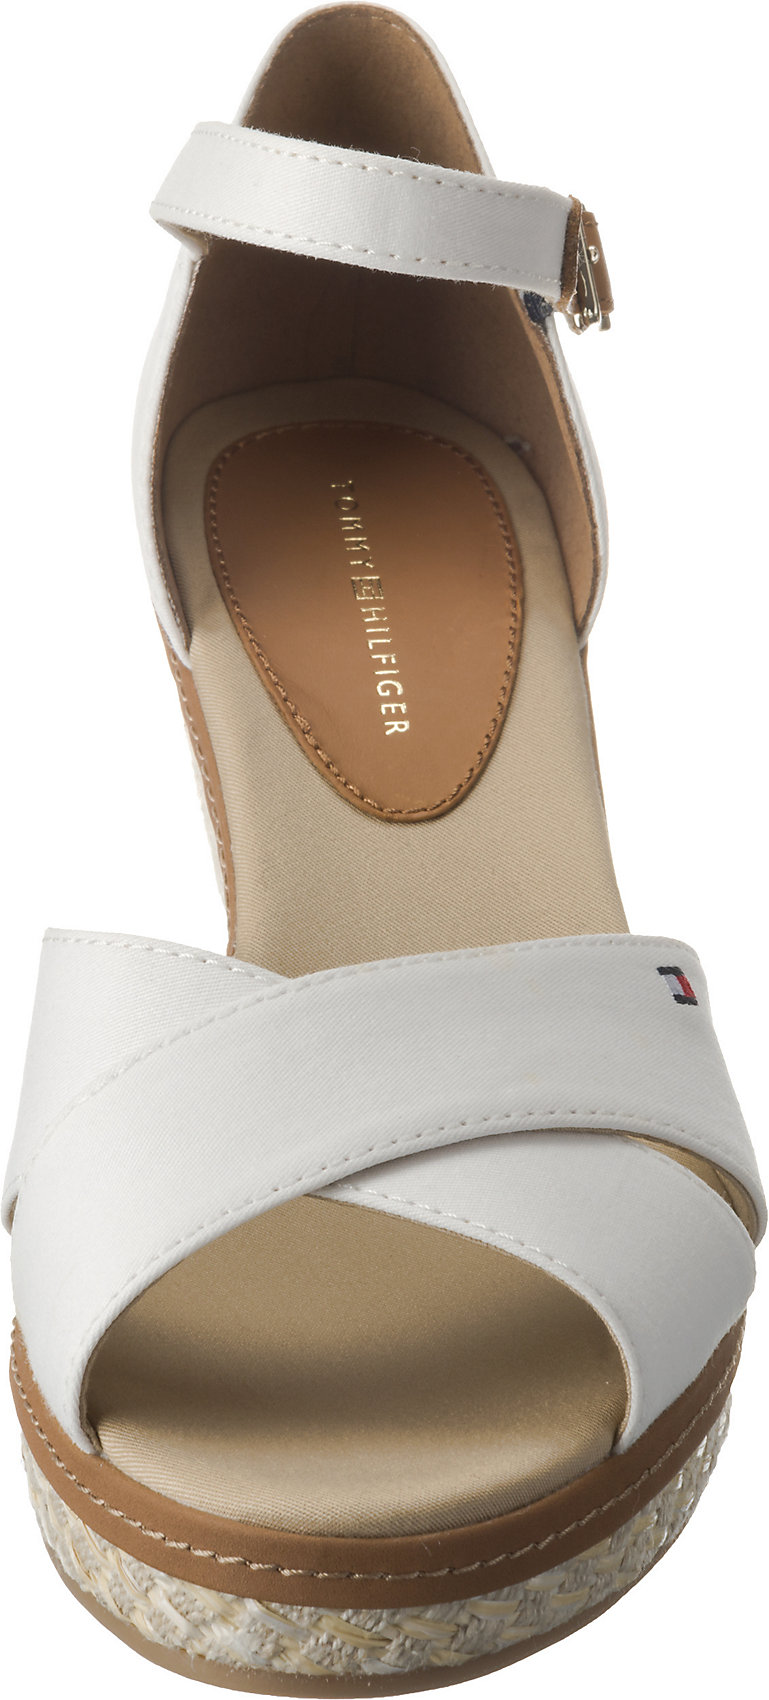 Elba Zu Neu Damen Tommy Details 7643032 Hilfiger Für Iconic Keilsandaletten Sandal Basic DWEHYI29